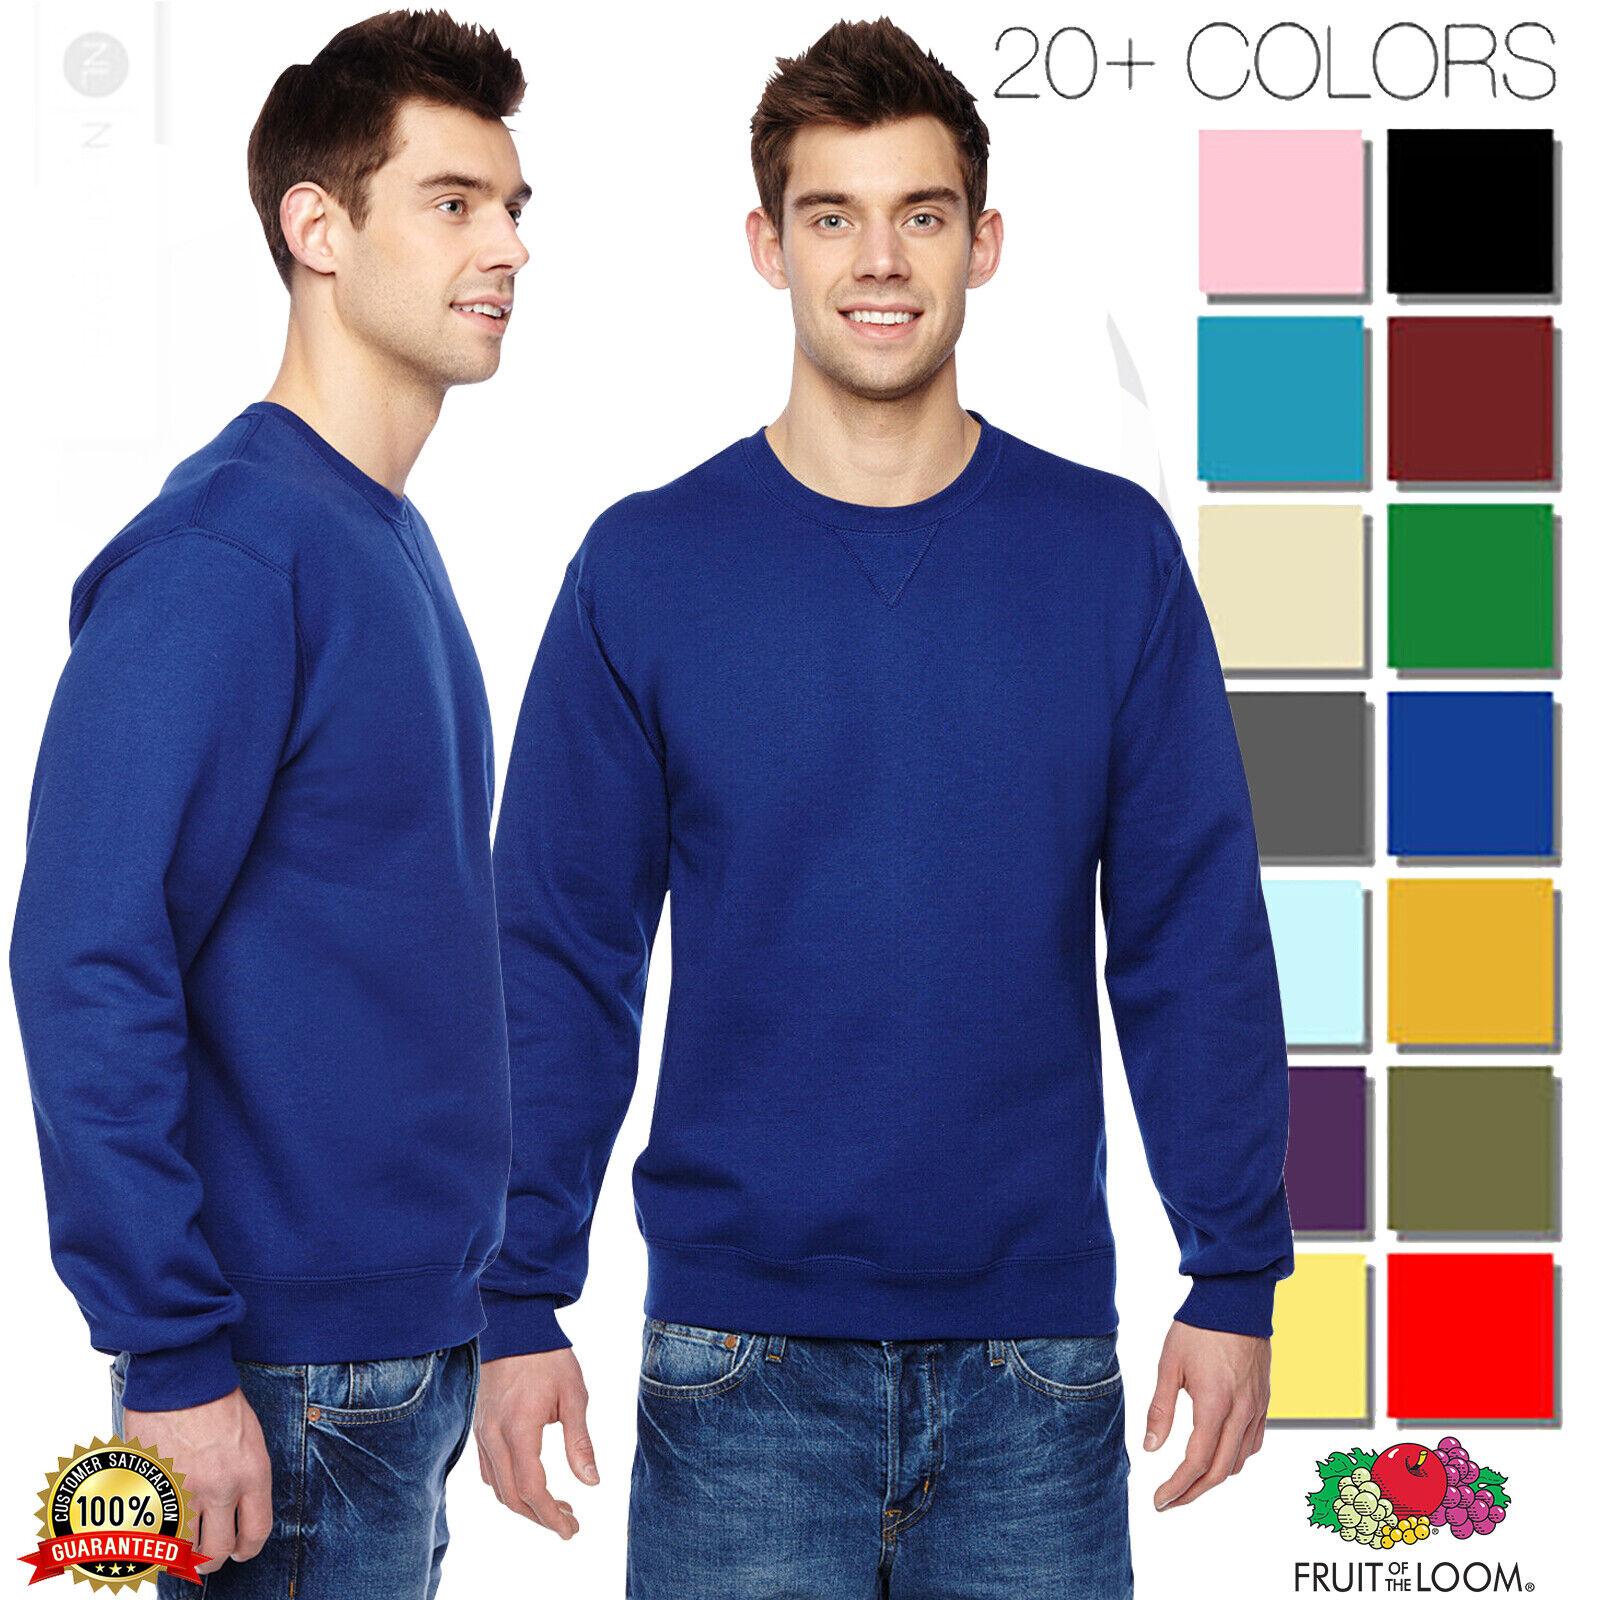 Fruit of the Loom SF72R Unisex 7.2oz Sofspun Crewneck Sweatshirt Cotton Blend